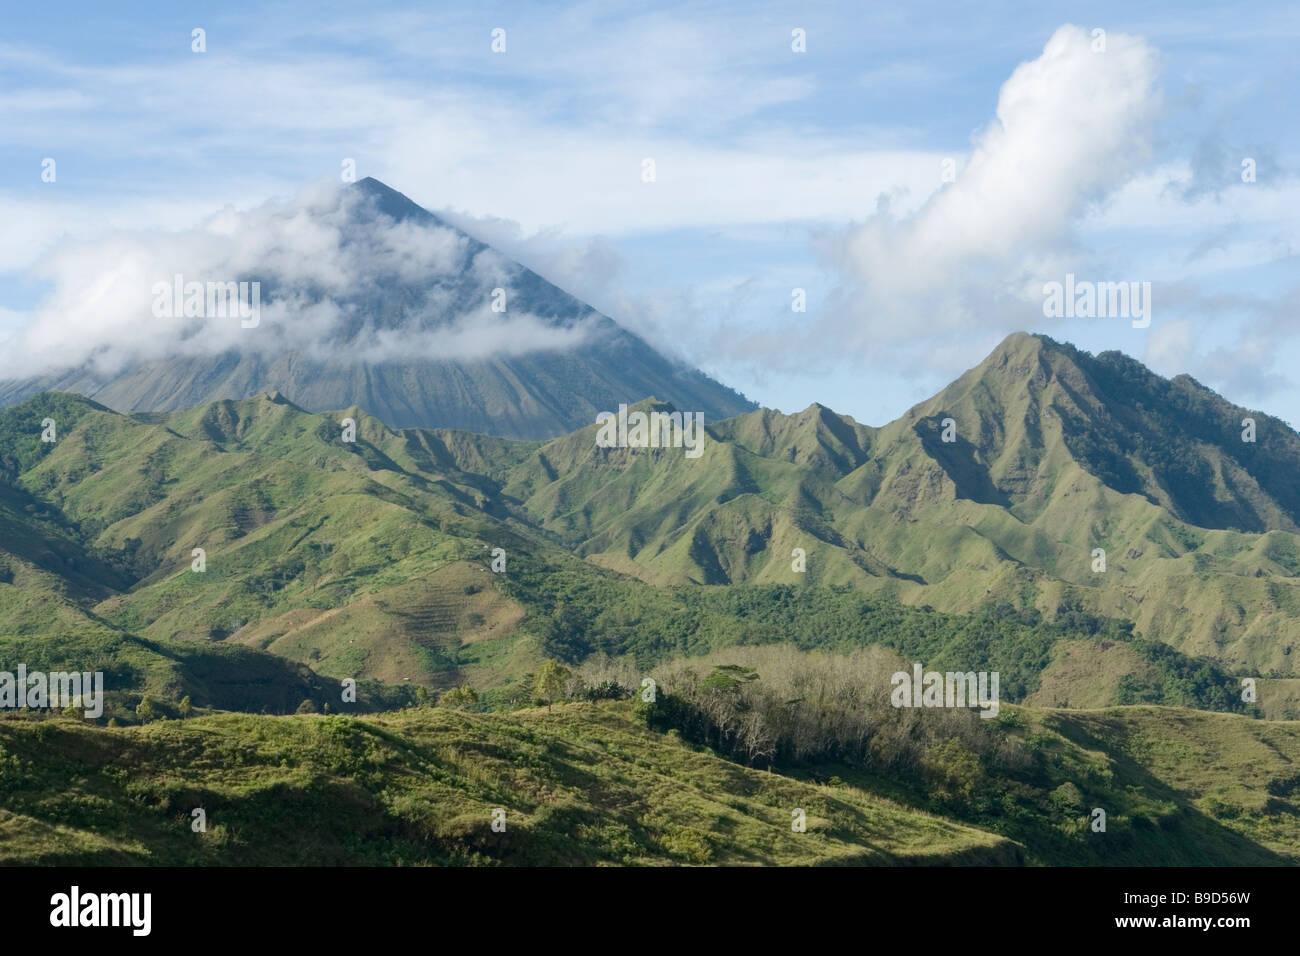 Le stratovolcan Inerie - Flores (Indonésie). Le stratovolcan Inerie (Florès - Indonésie). Photo Stock